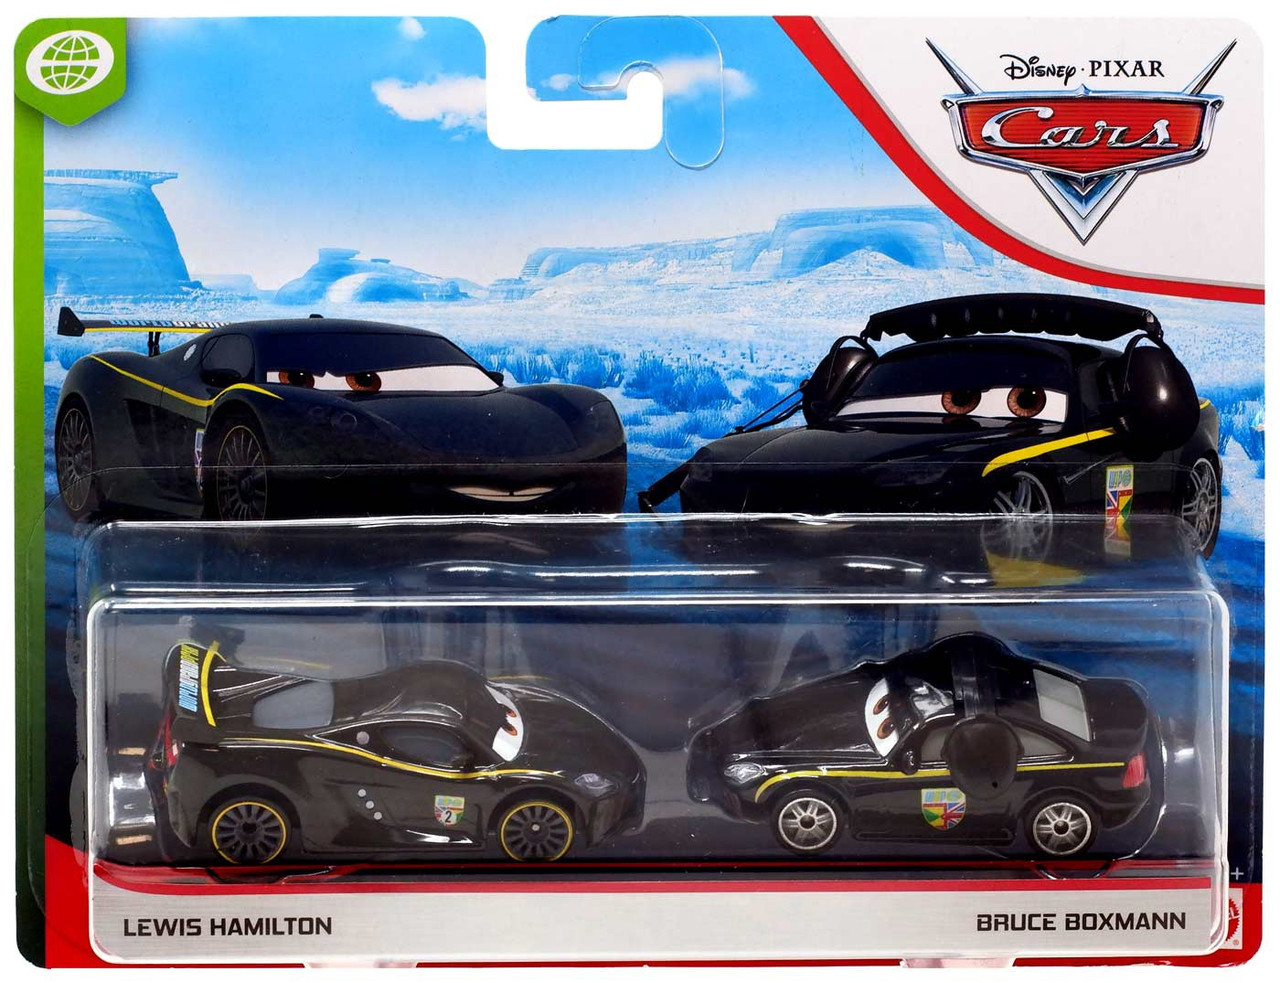 Mattel Disney Pixar Cars 2 LEWIS HAMILTON #24 Car 1:55 Scale